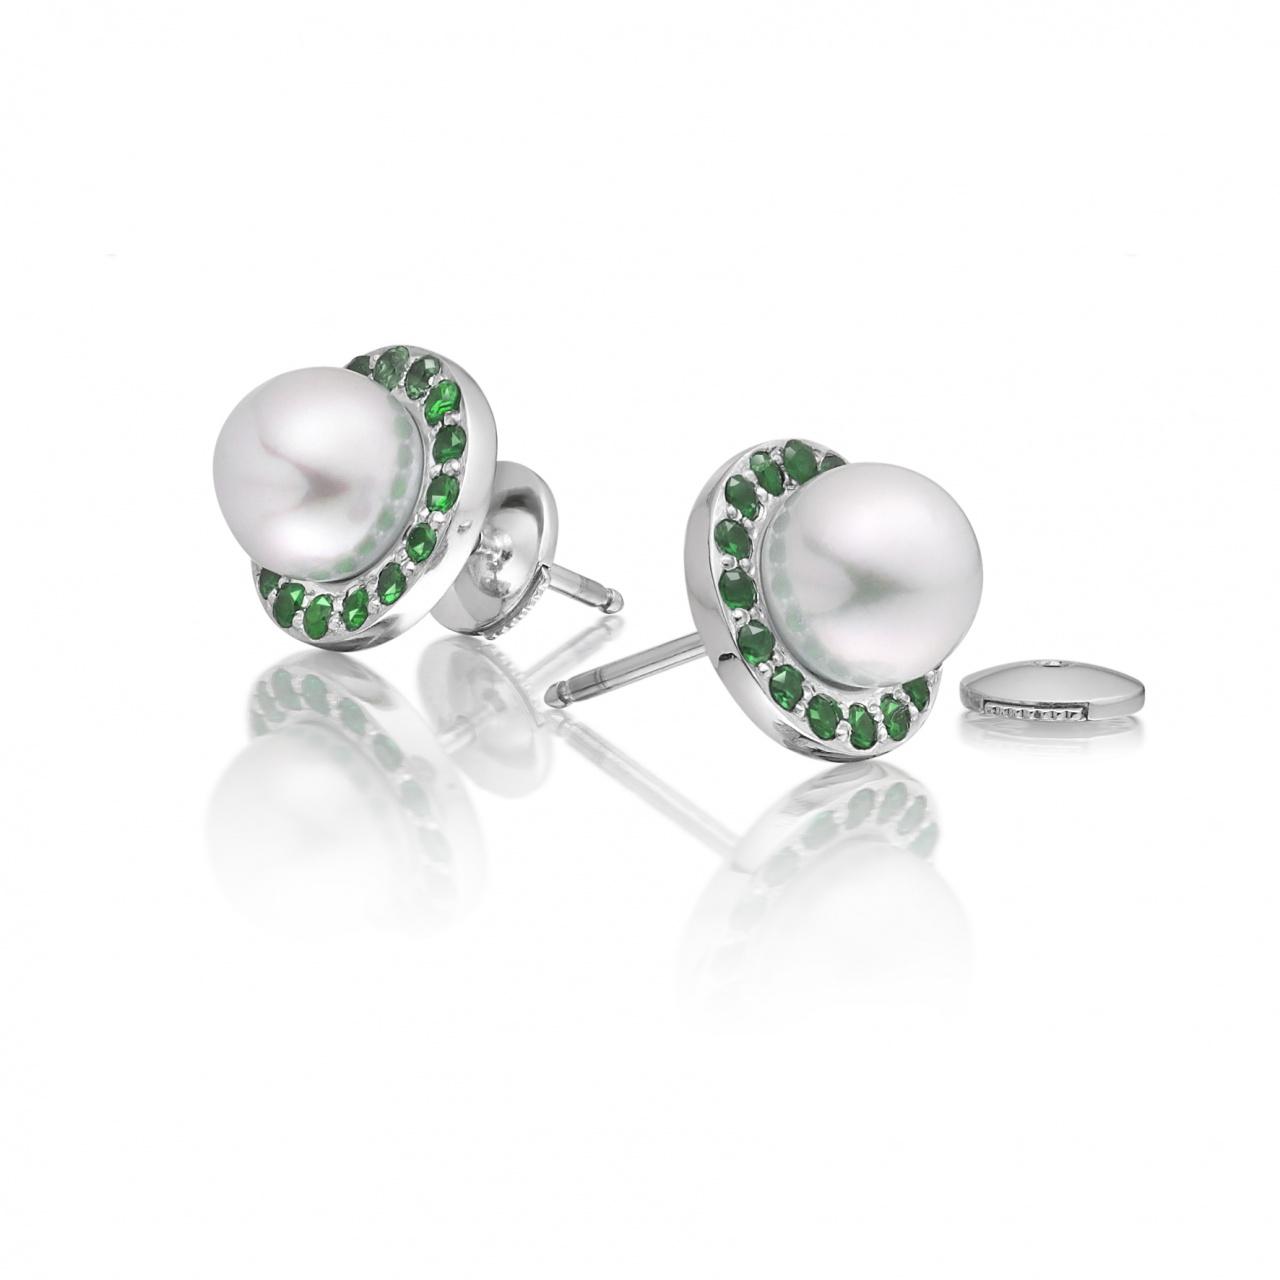 Tsavorite Garnet and Akoya Pearl Stud Earrings with 18ct Gold